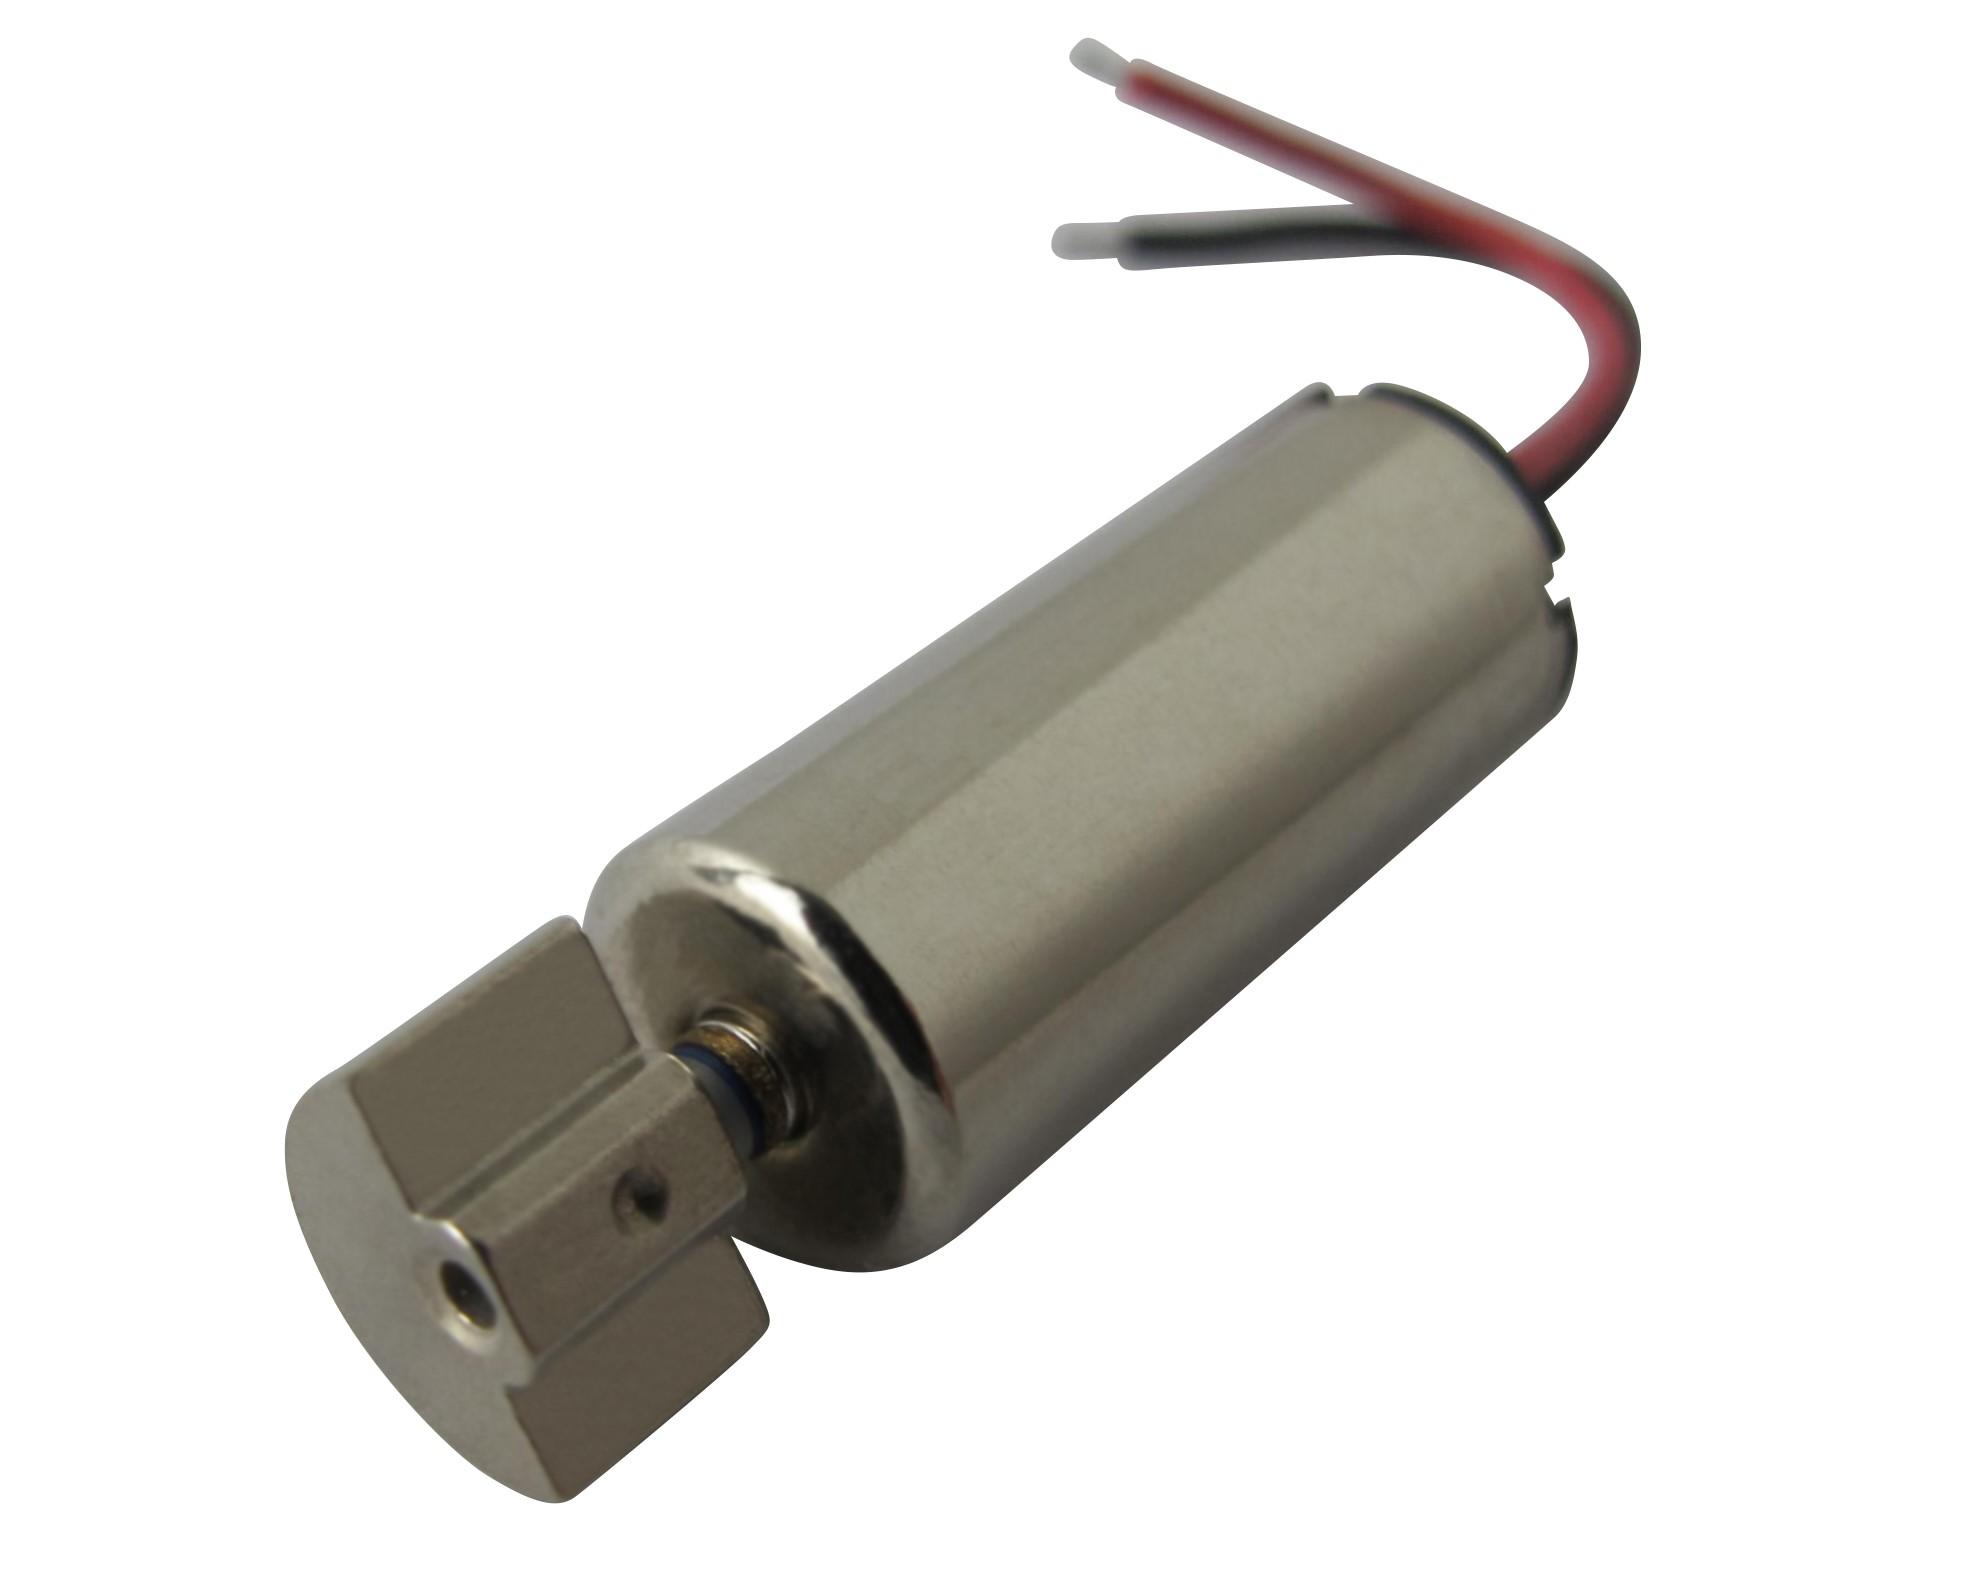 Z7AL2A1690001 Cylindrical Vibrator Motor